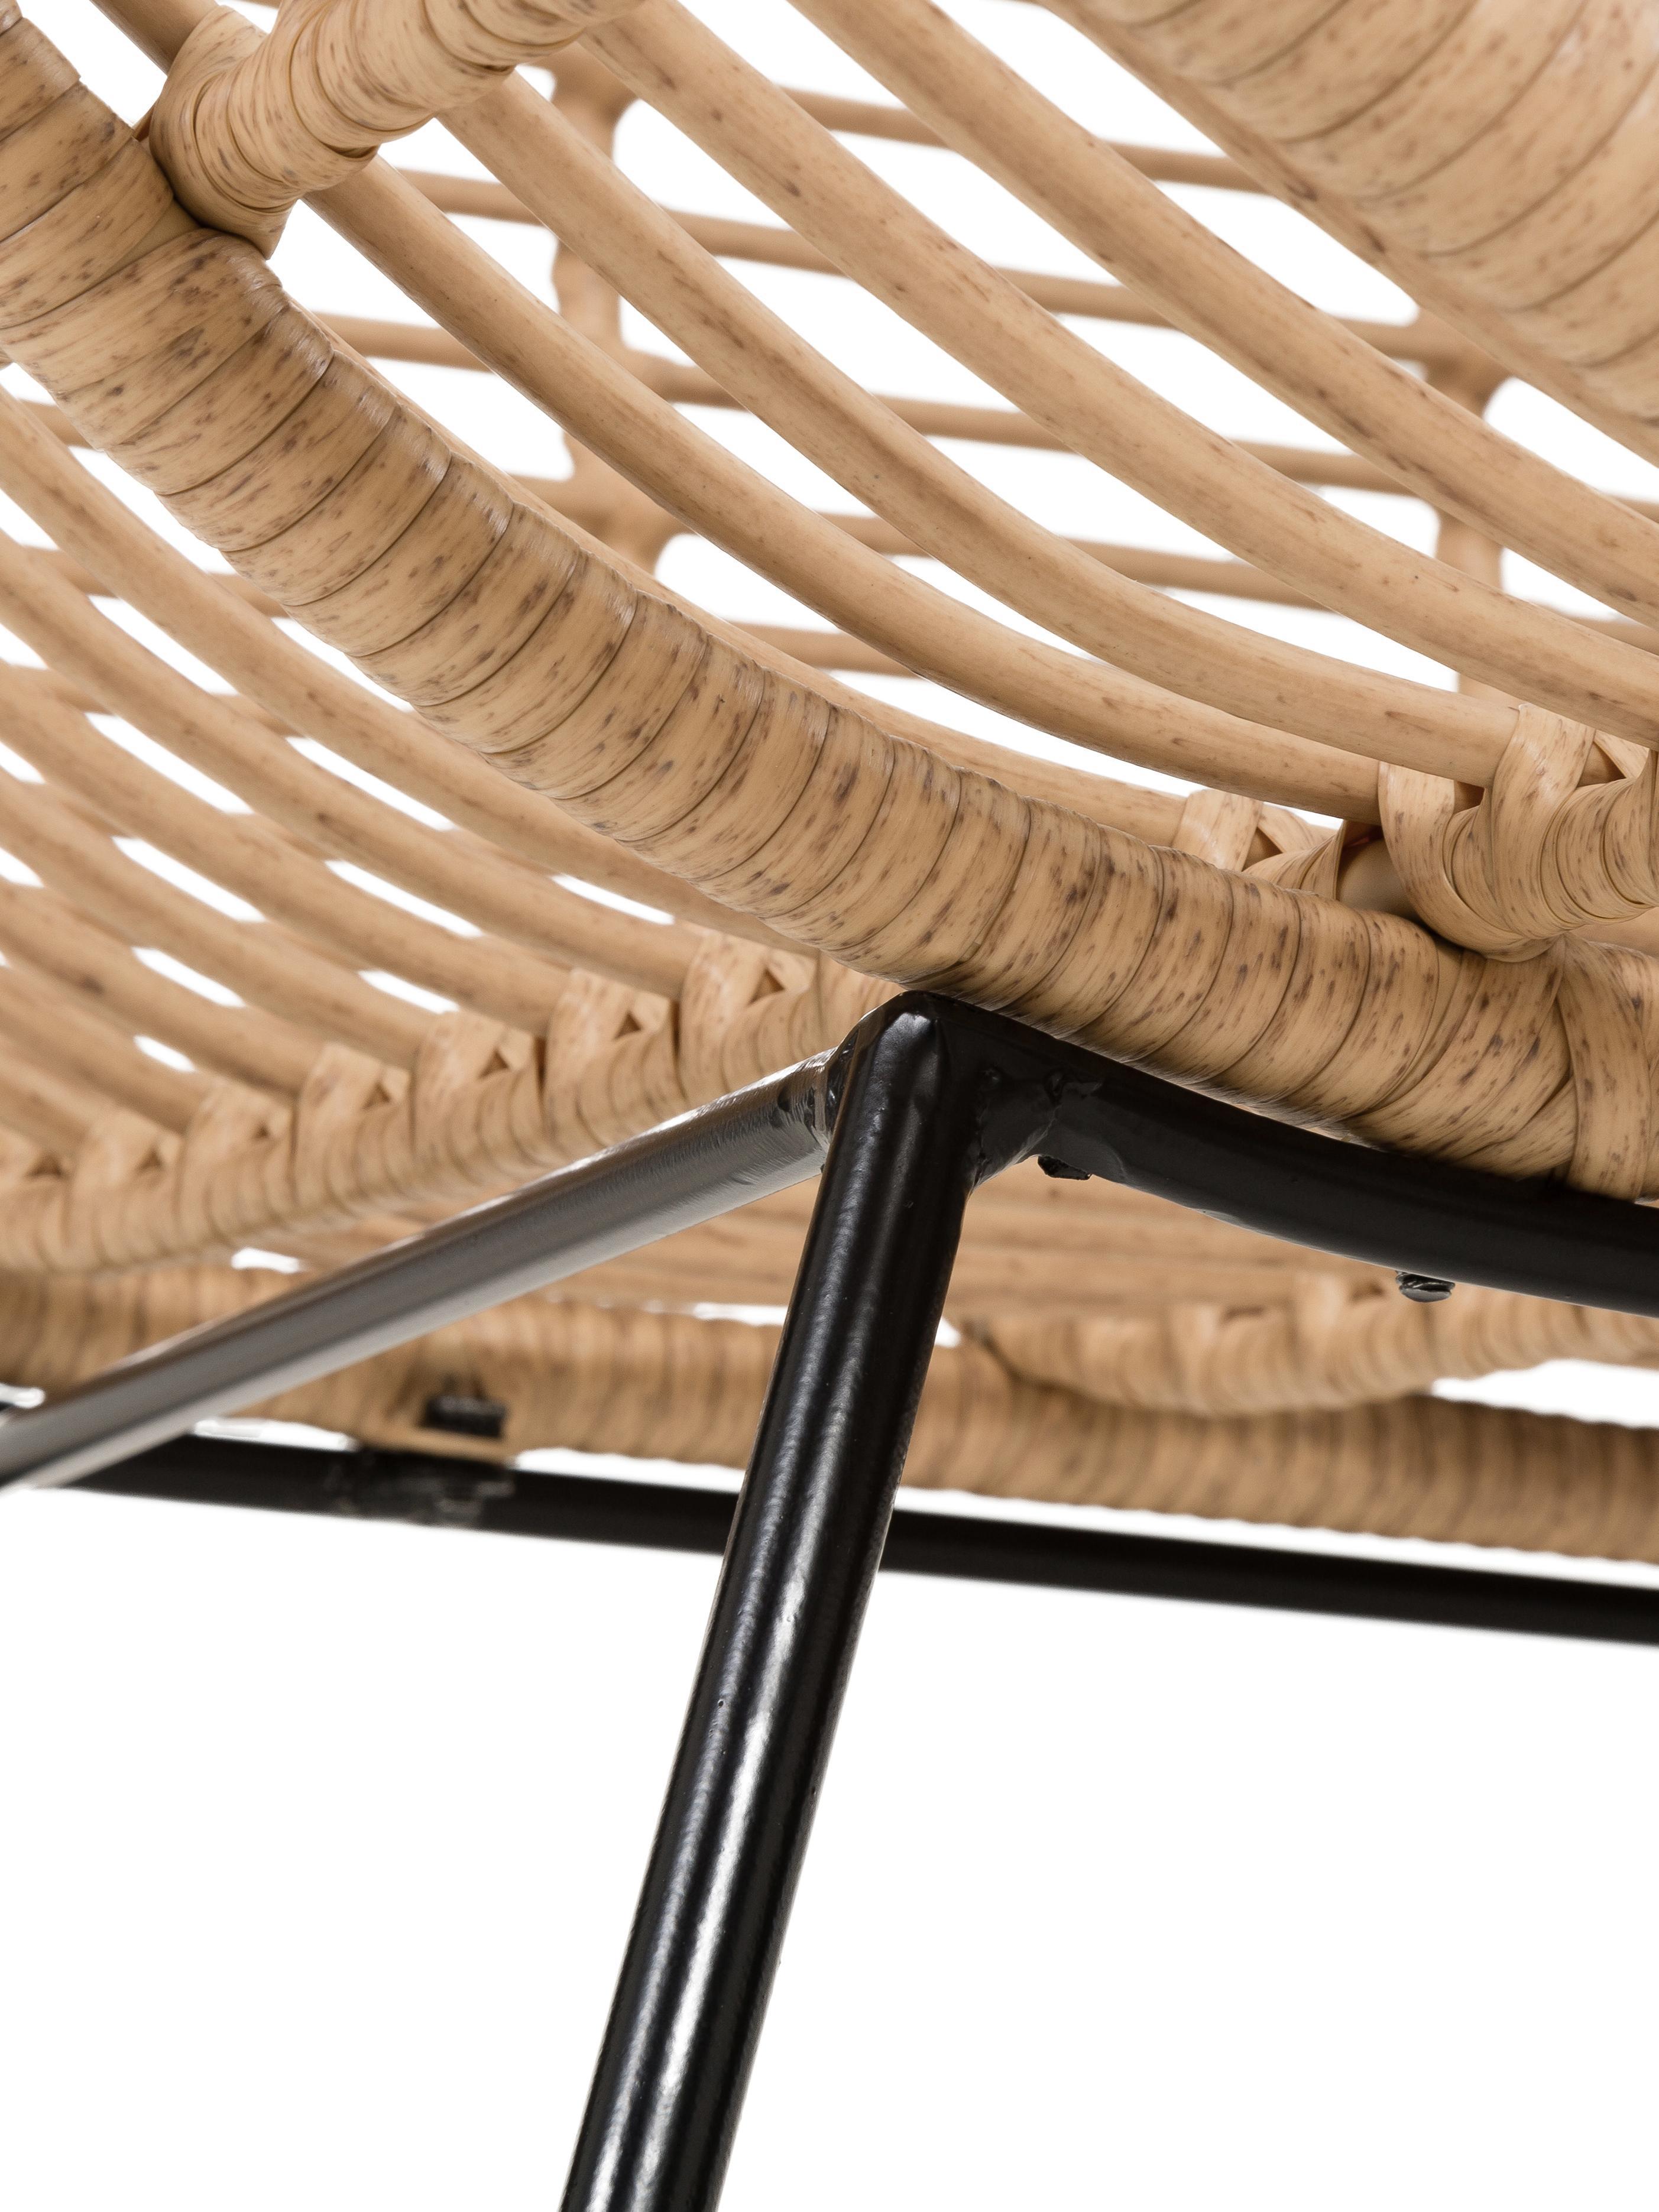 Ohrensessel Costa mit Polyrattan, Sitzfläche: Polyethylen-Geflecht, Gestell: Metall, pulverbeschichtet, Hellbraun, B 90 x T 89 cm